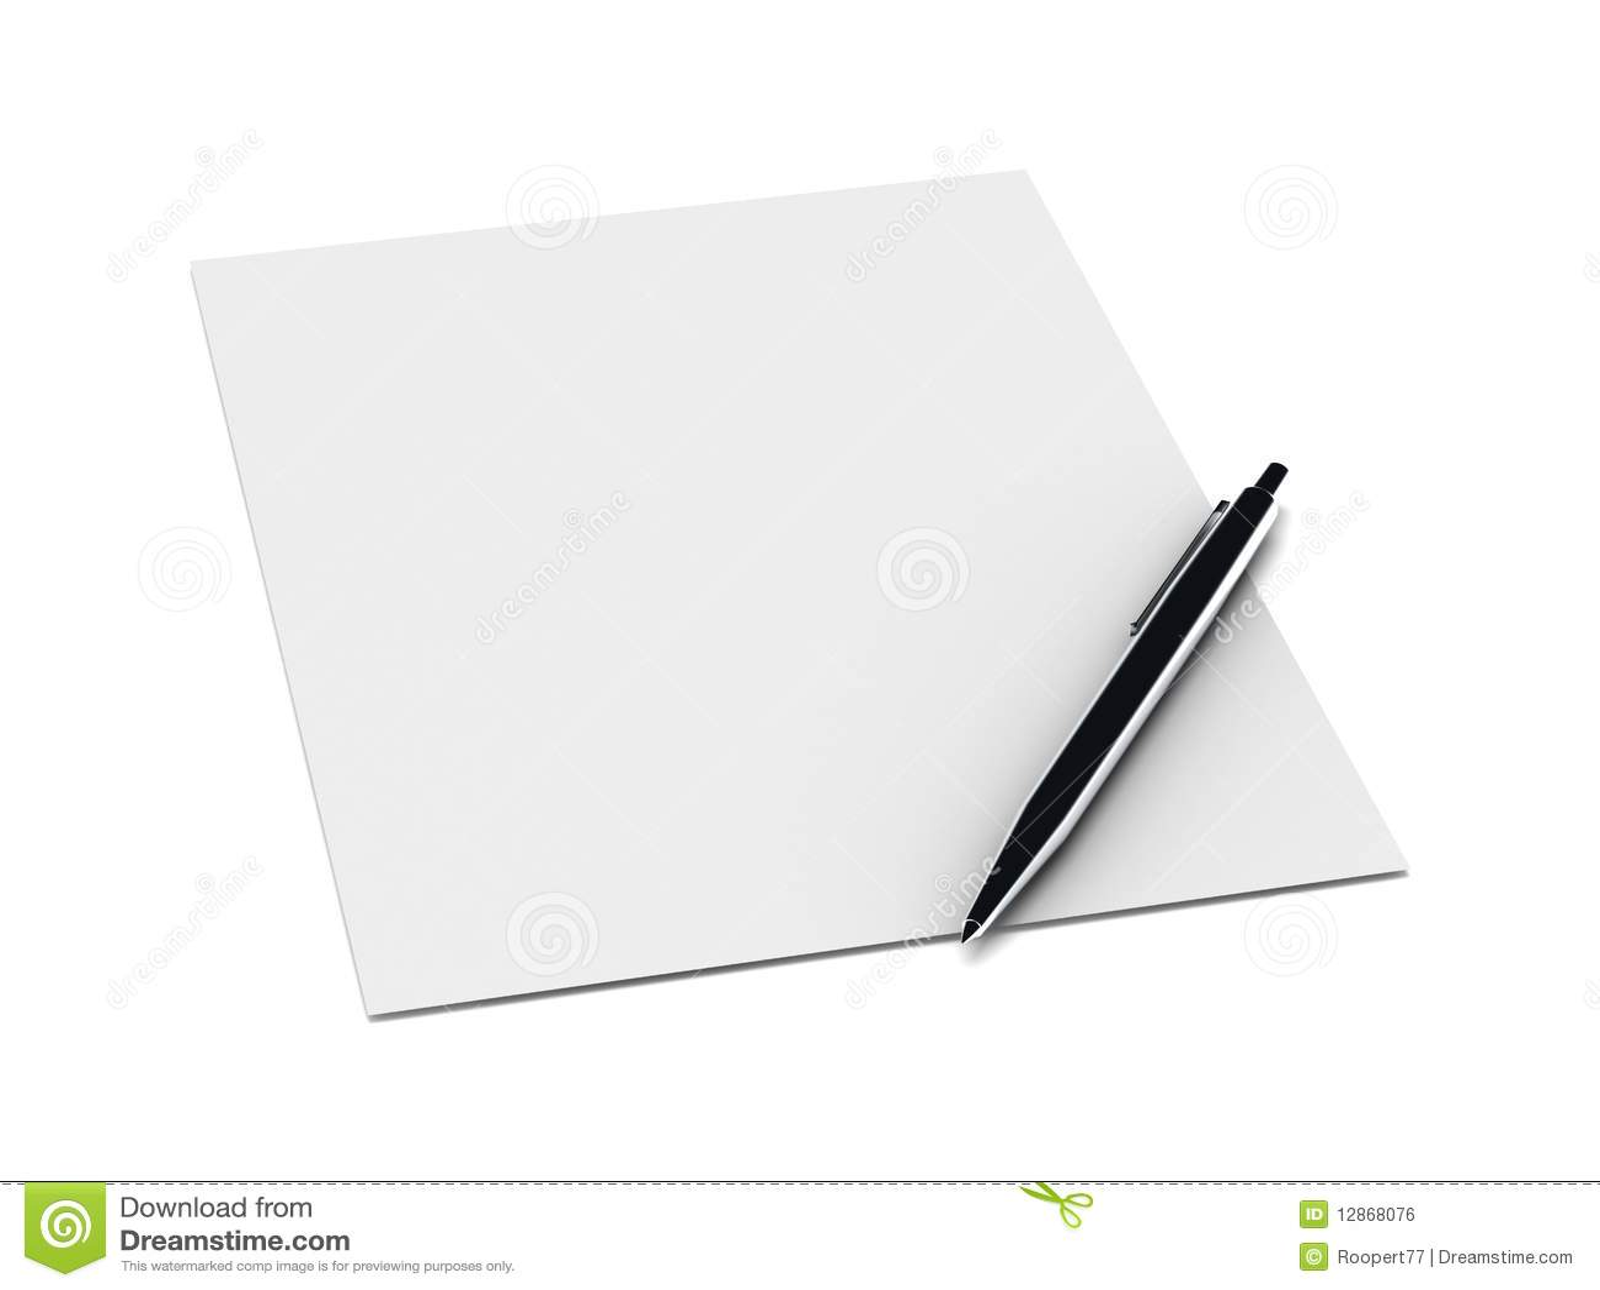 Metal Pen On A Blank Sheet Of Paper Stock Illustration